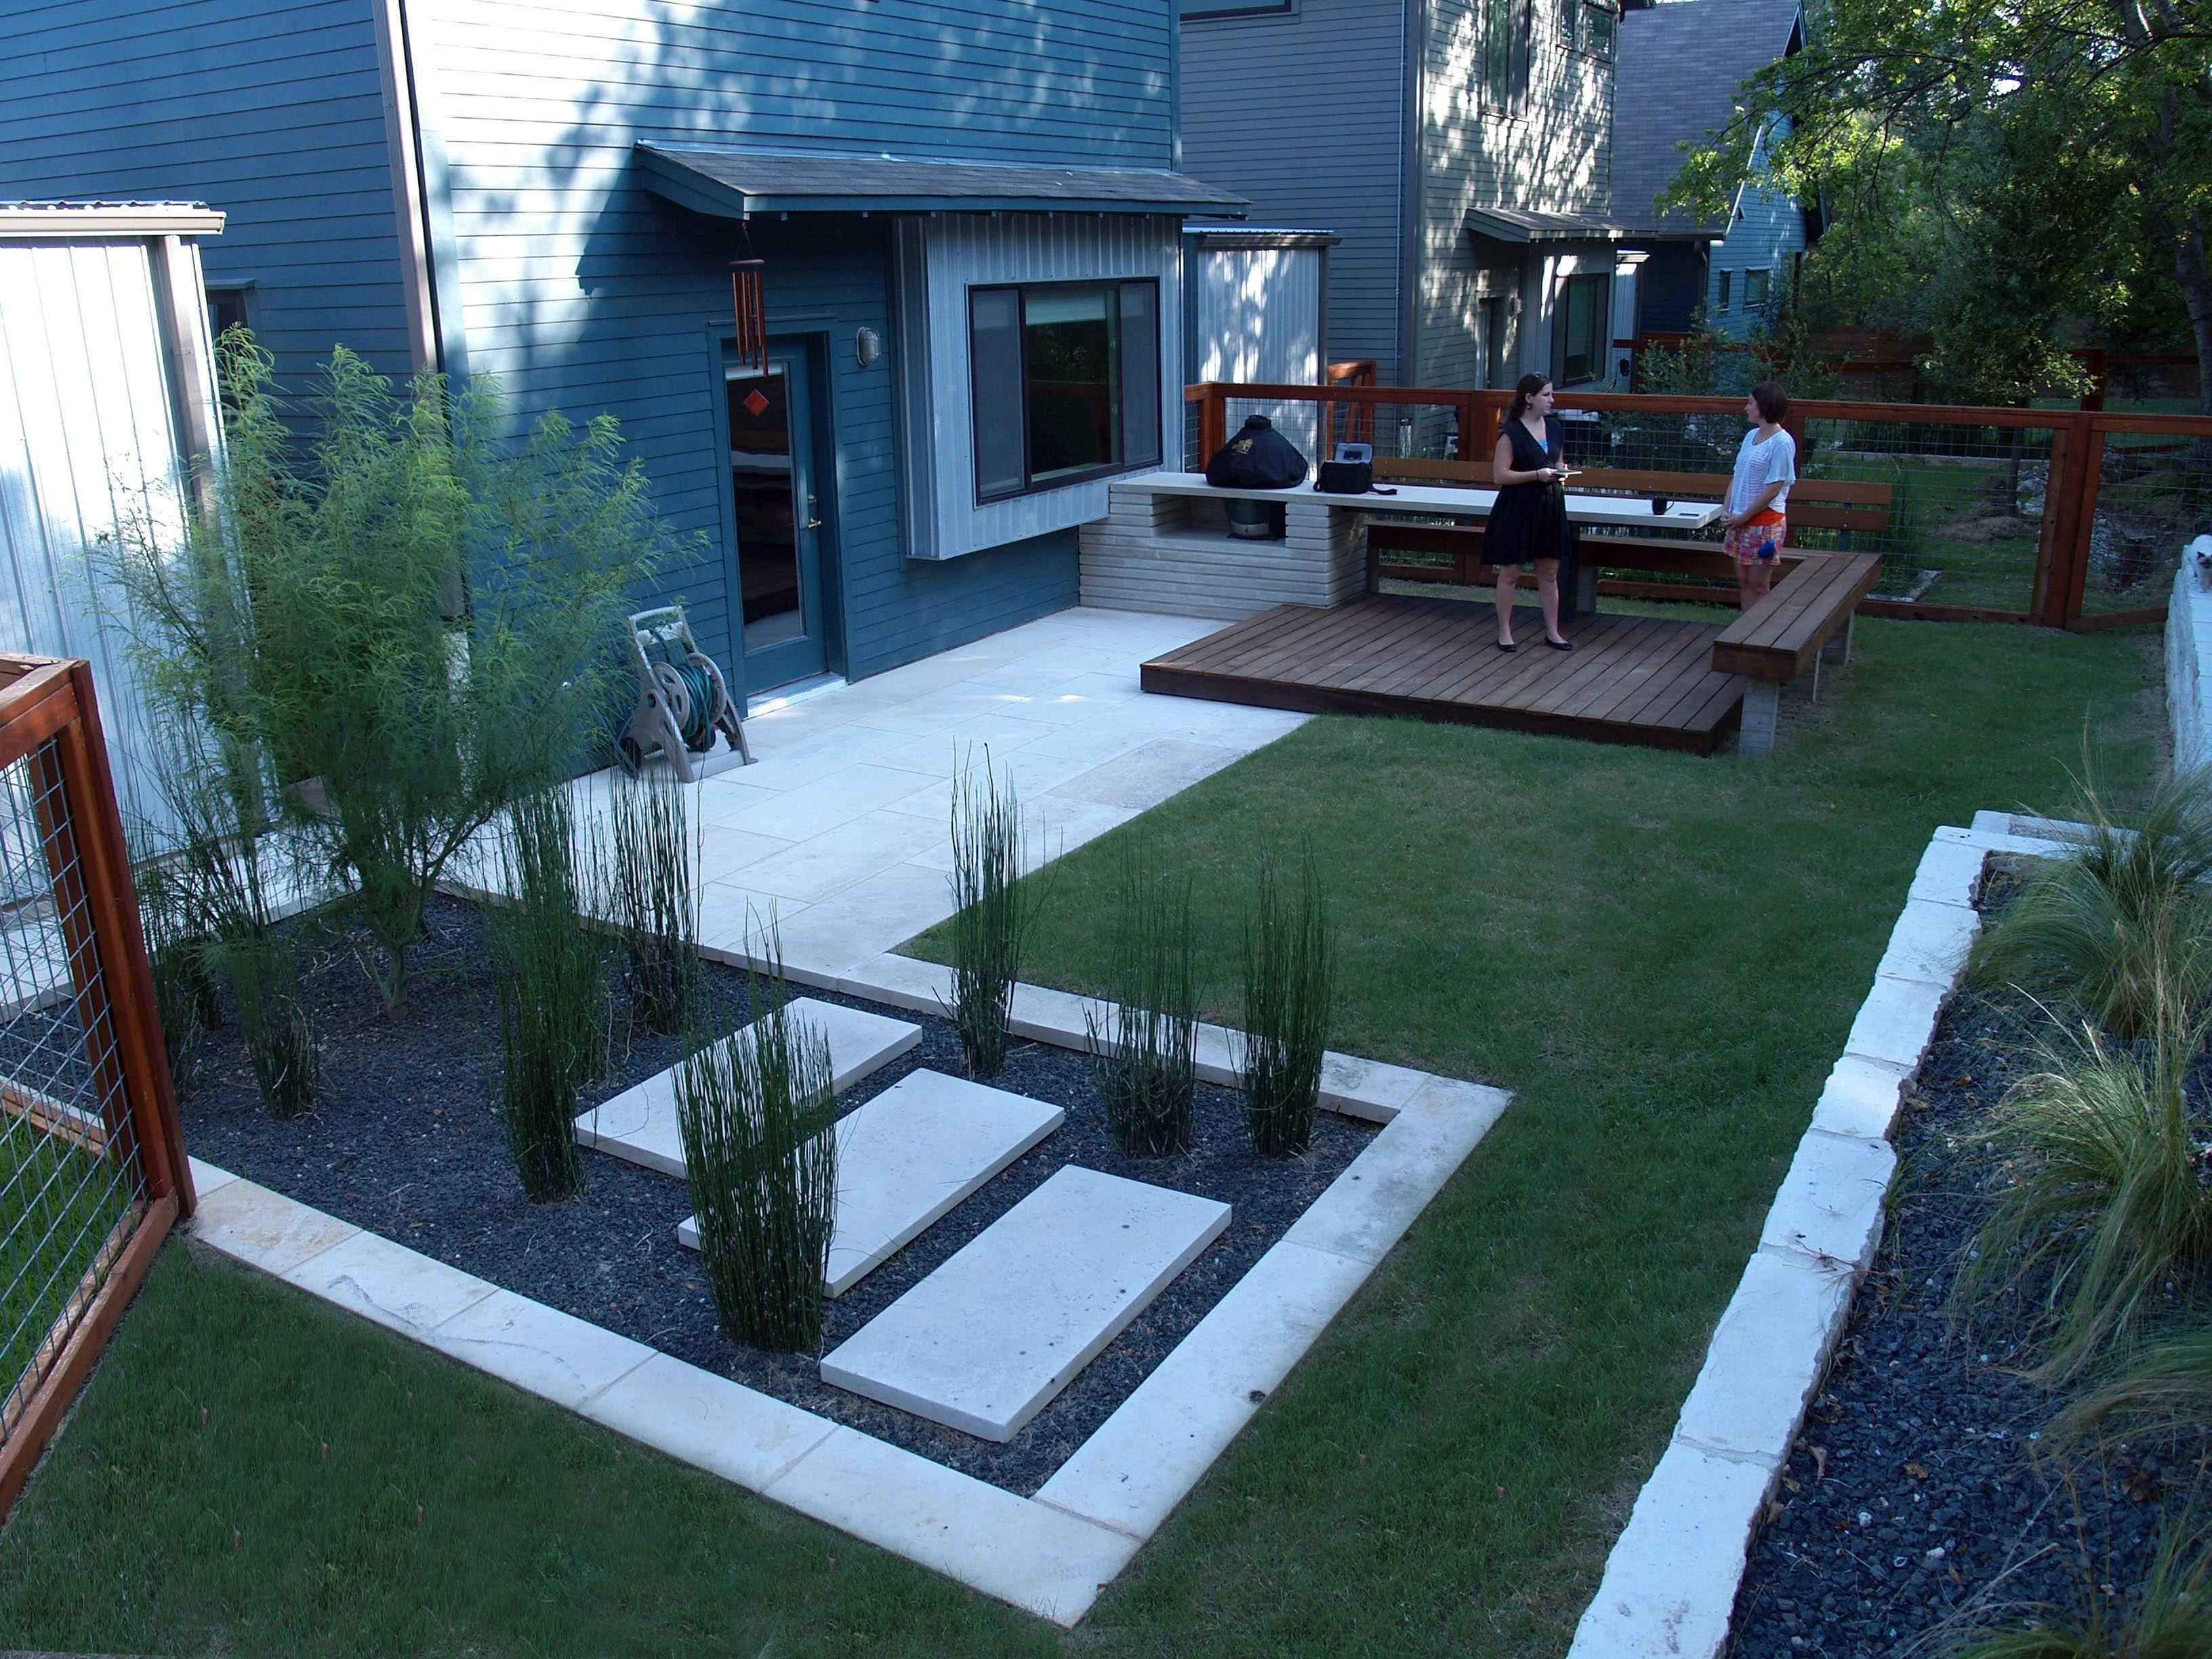 Marvelous 24 Marvelous Simple Backyard Landscaping Ideas ... on Modern Boma Ideas  id=17927